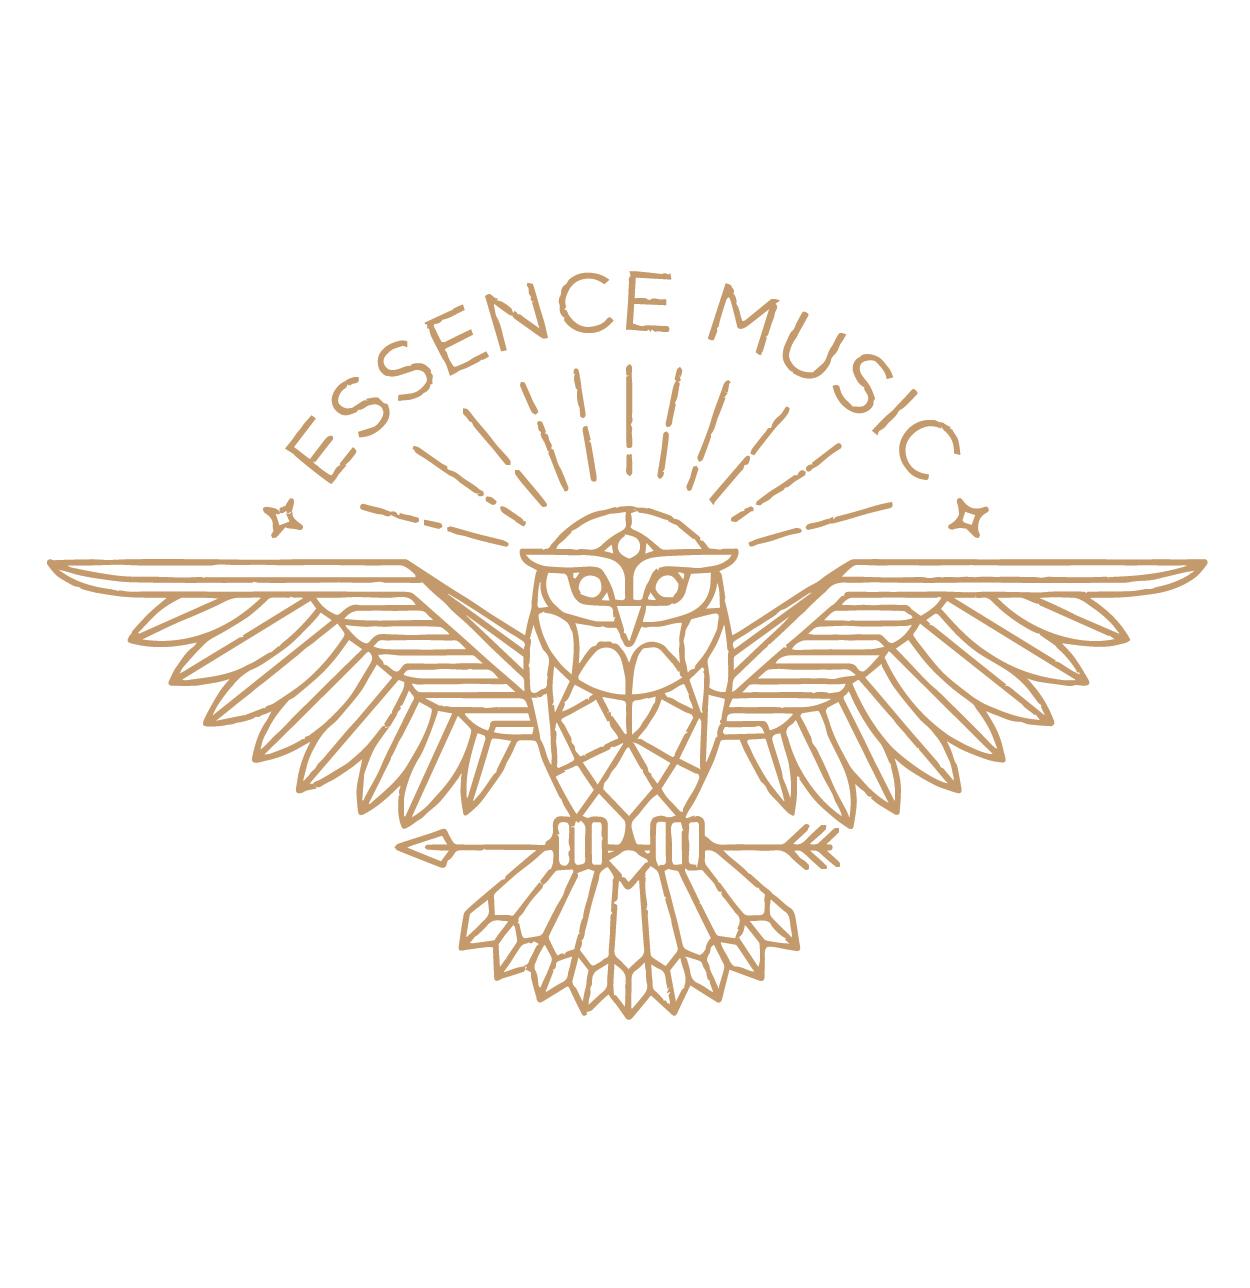 Essence Music